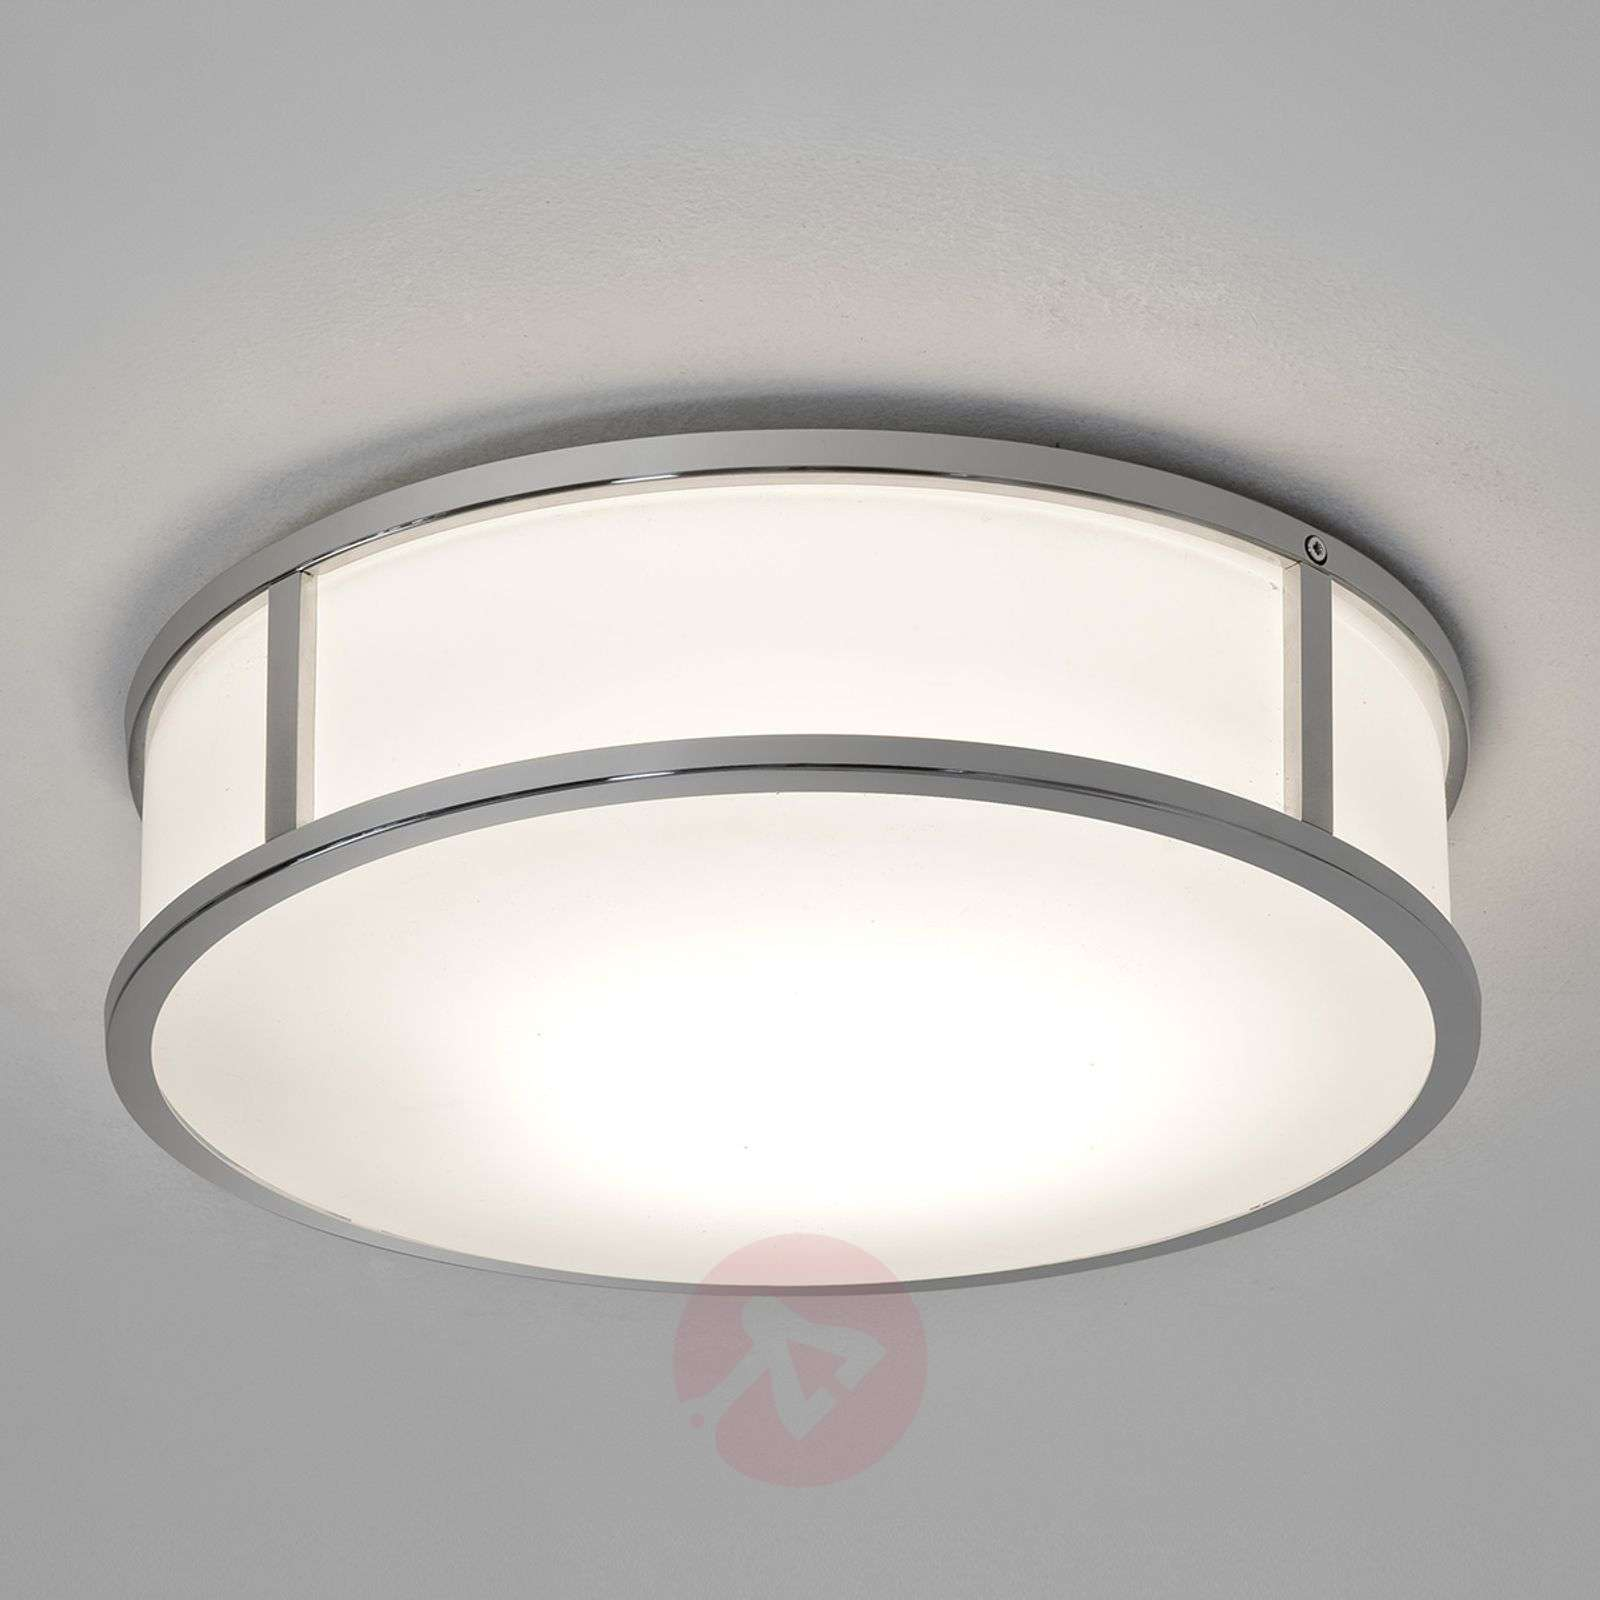 Mashiko Round 300 Bathroom Ceiling Light-1020466-05